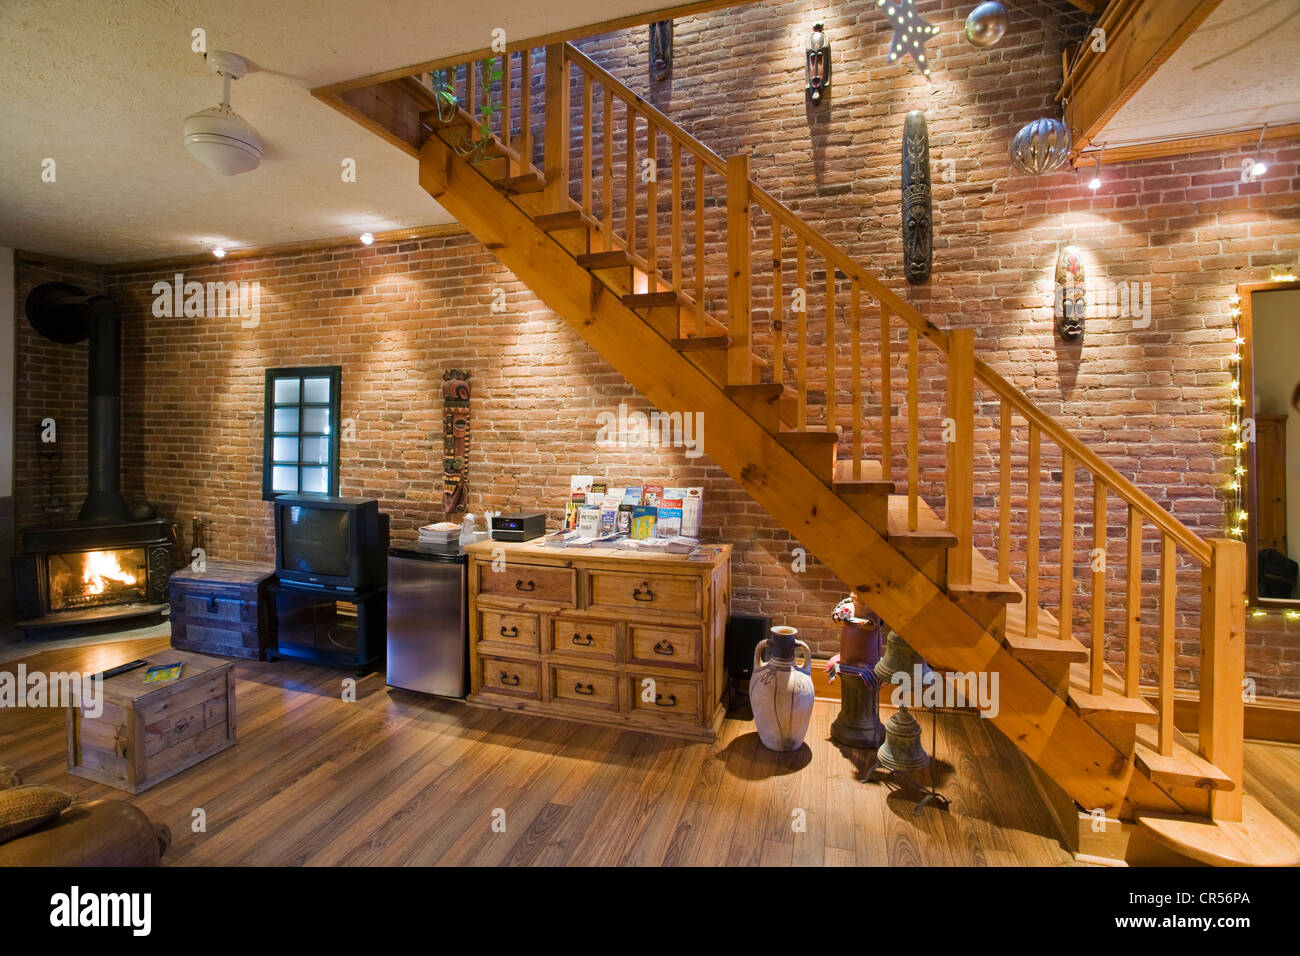 canada quebec province montreal quartier latin rue. Black Bedroom Furniture Sets. Home Design Ideas